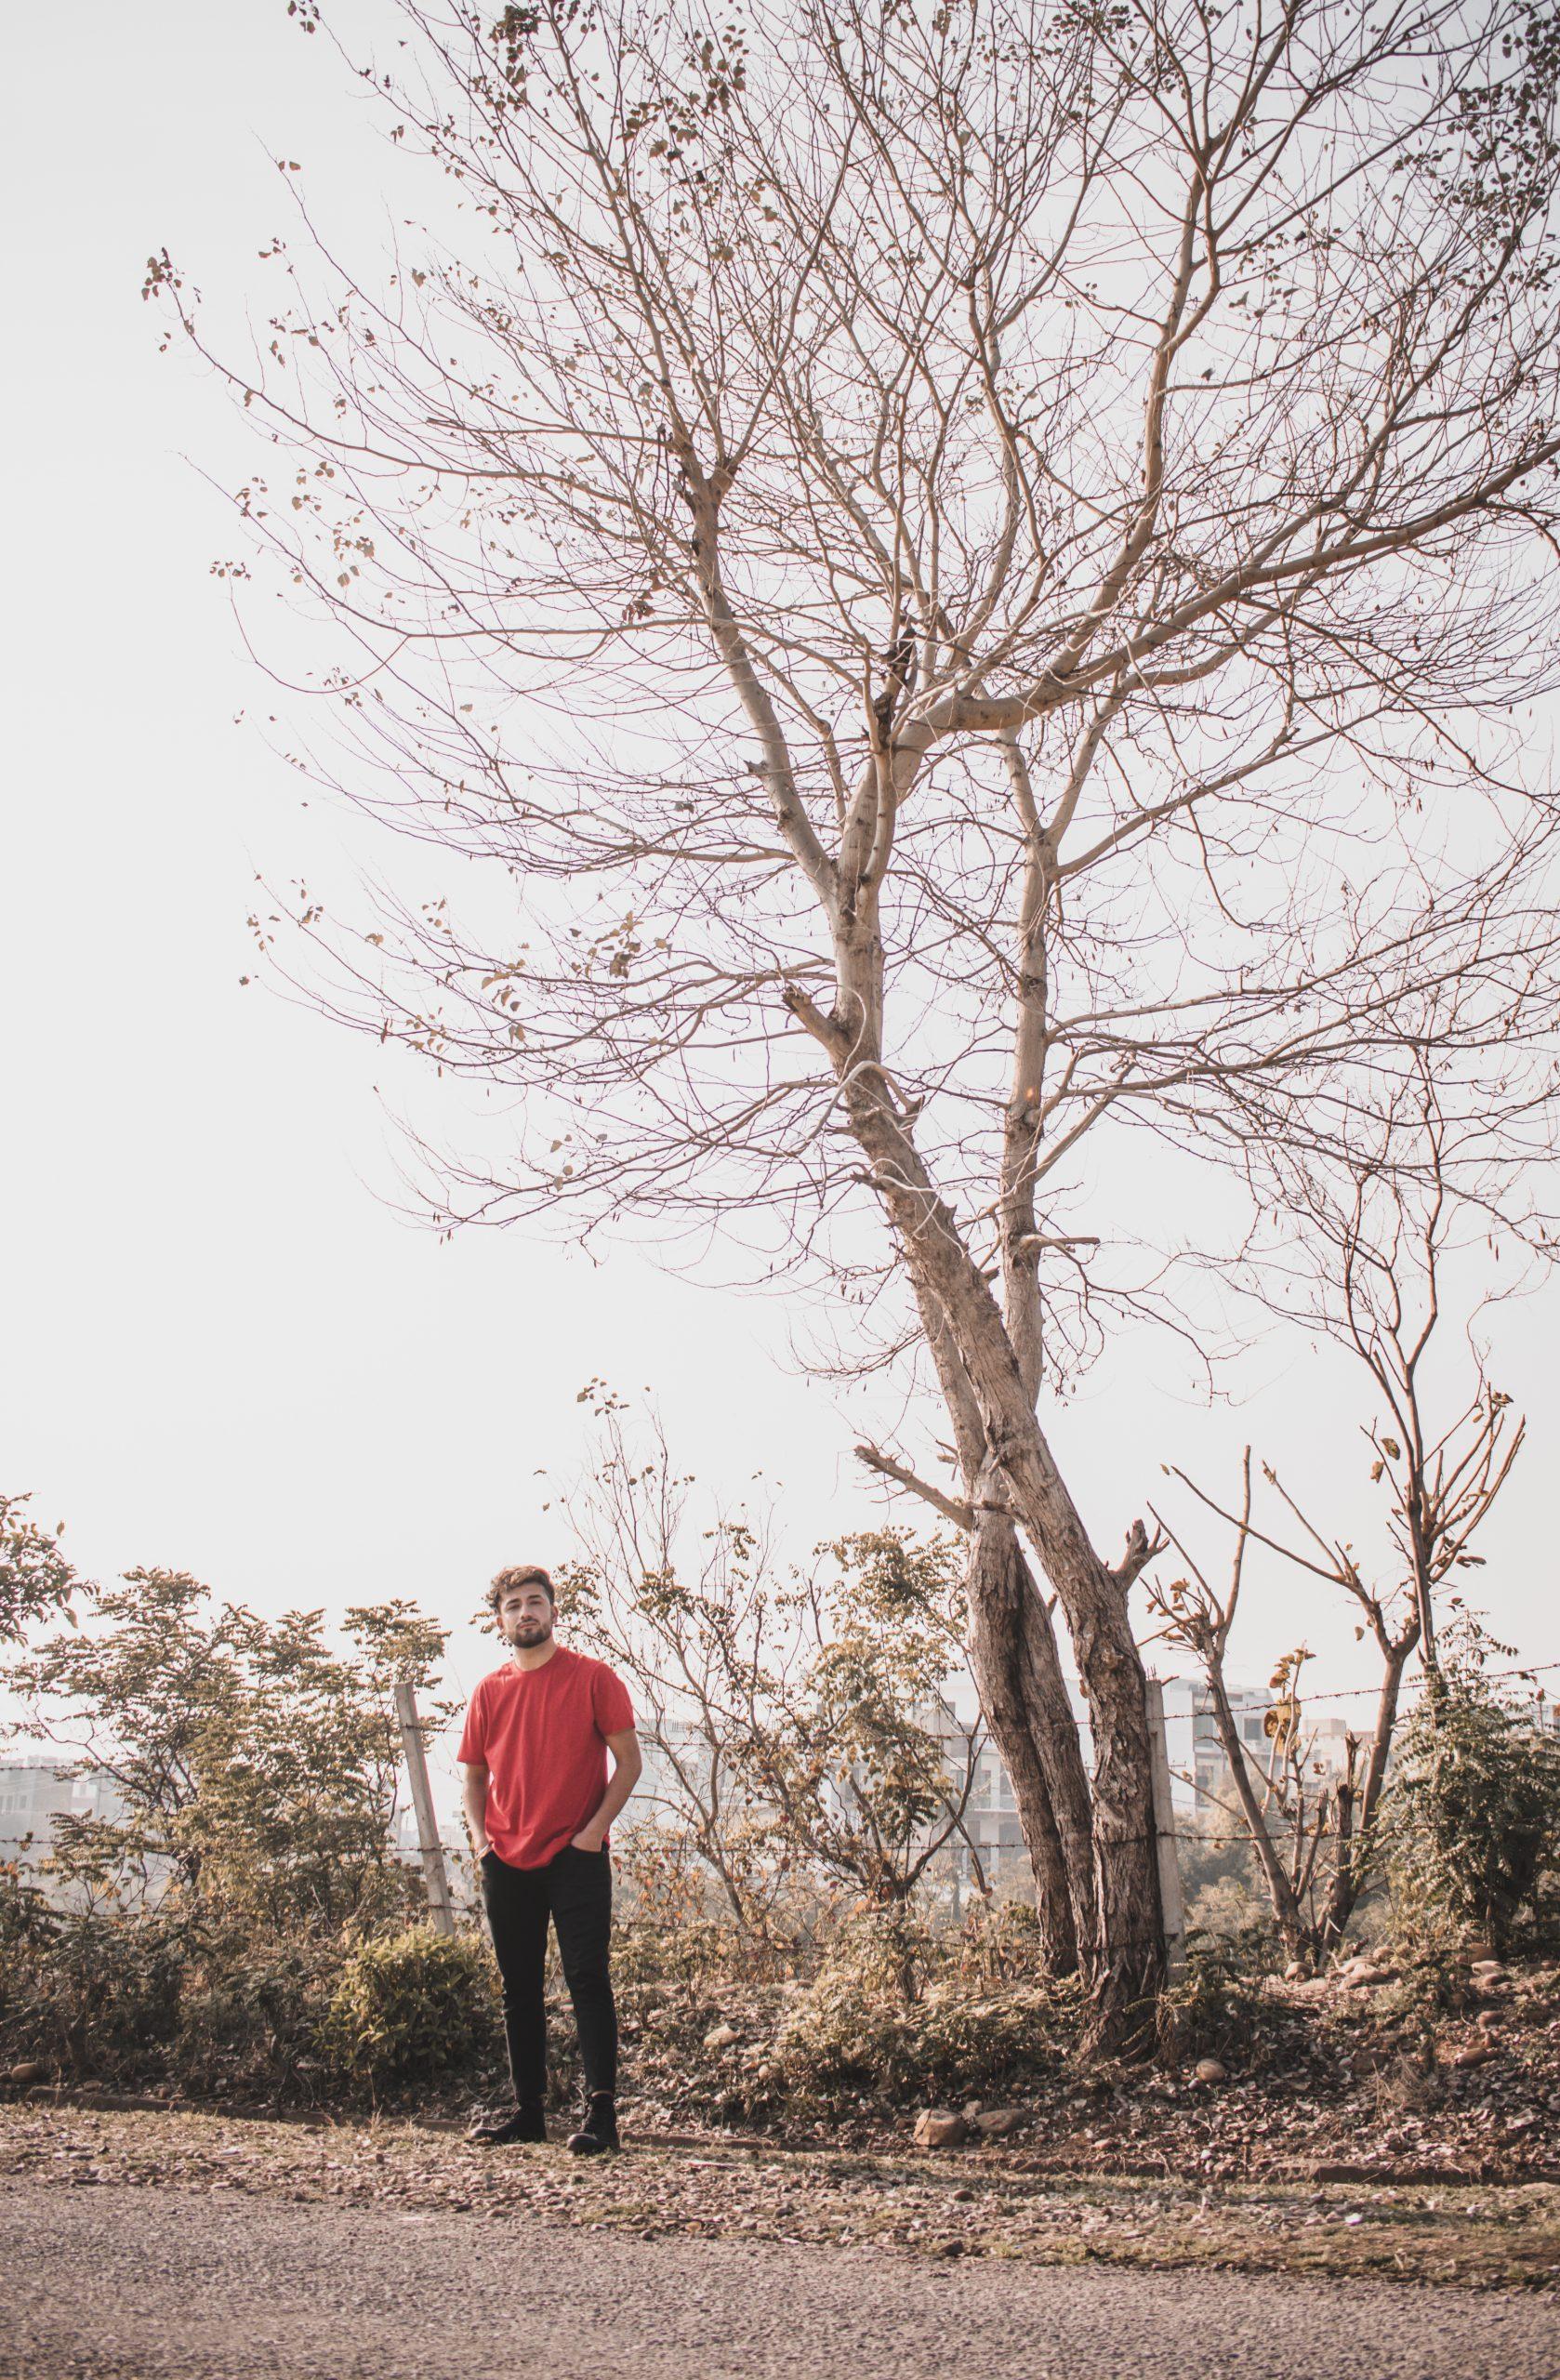 A boy under a tree